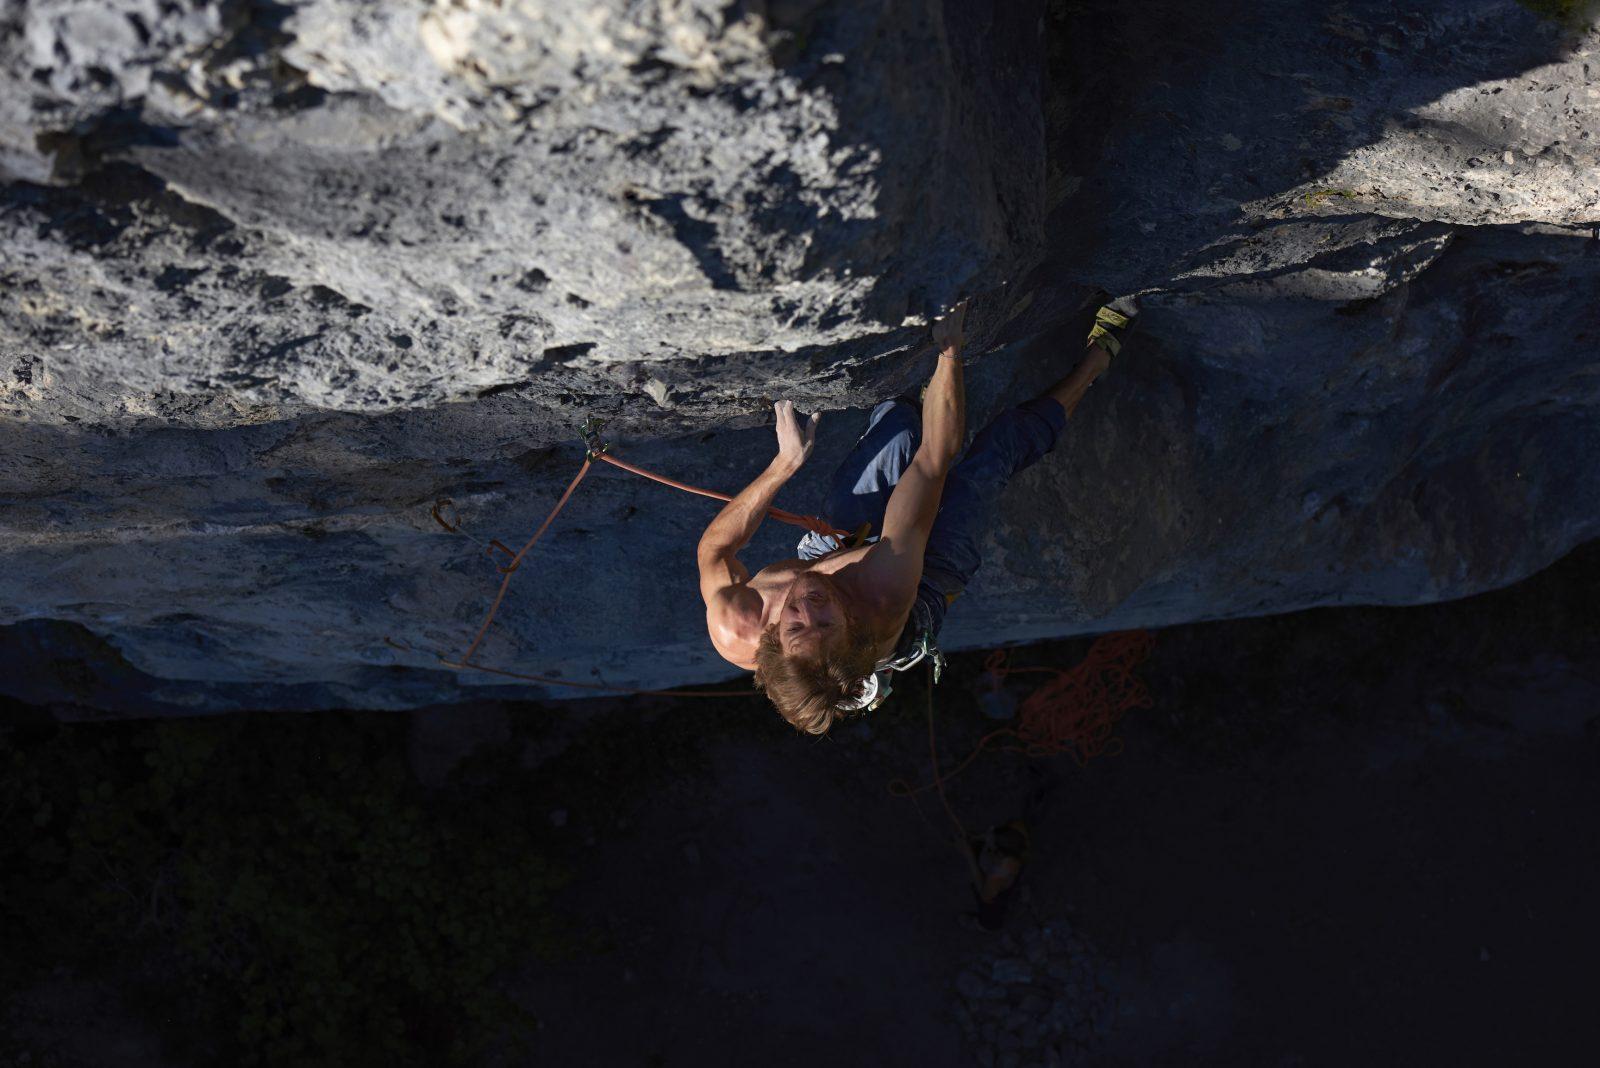 Klettern an der Geisterschmiedwand bei Kufstein, Foto: Michael Meisl